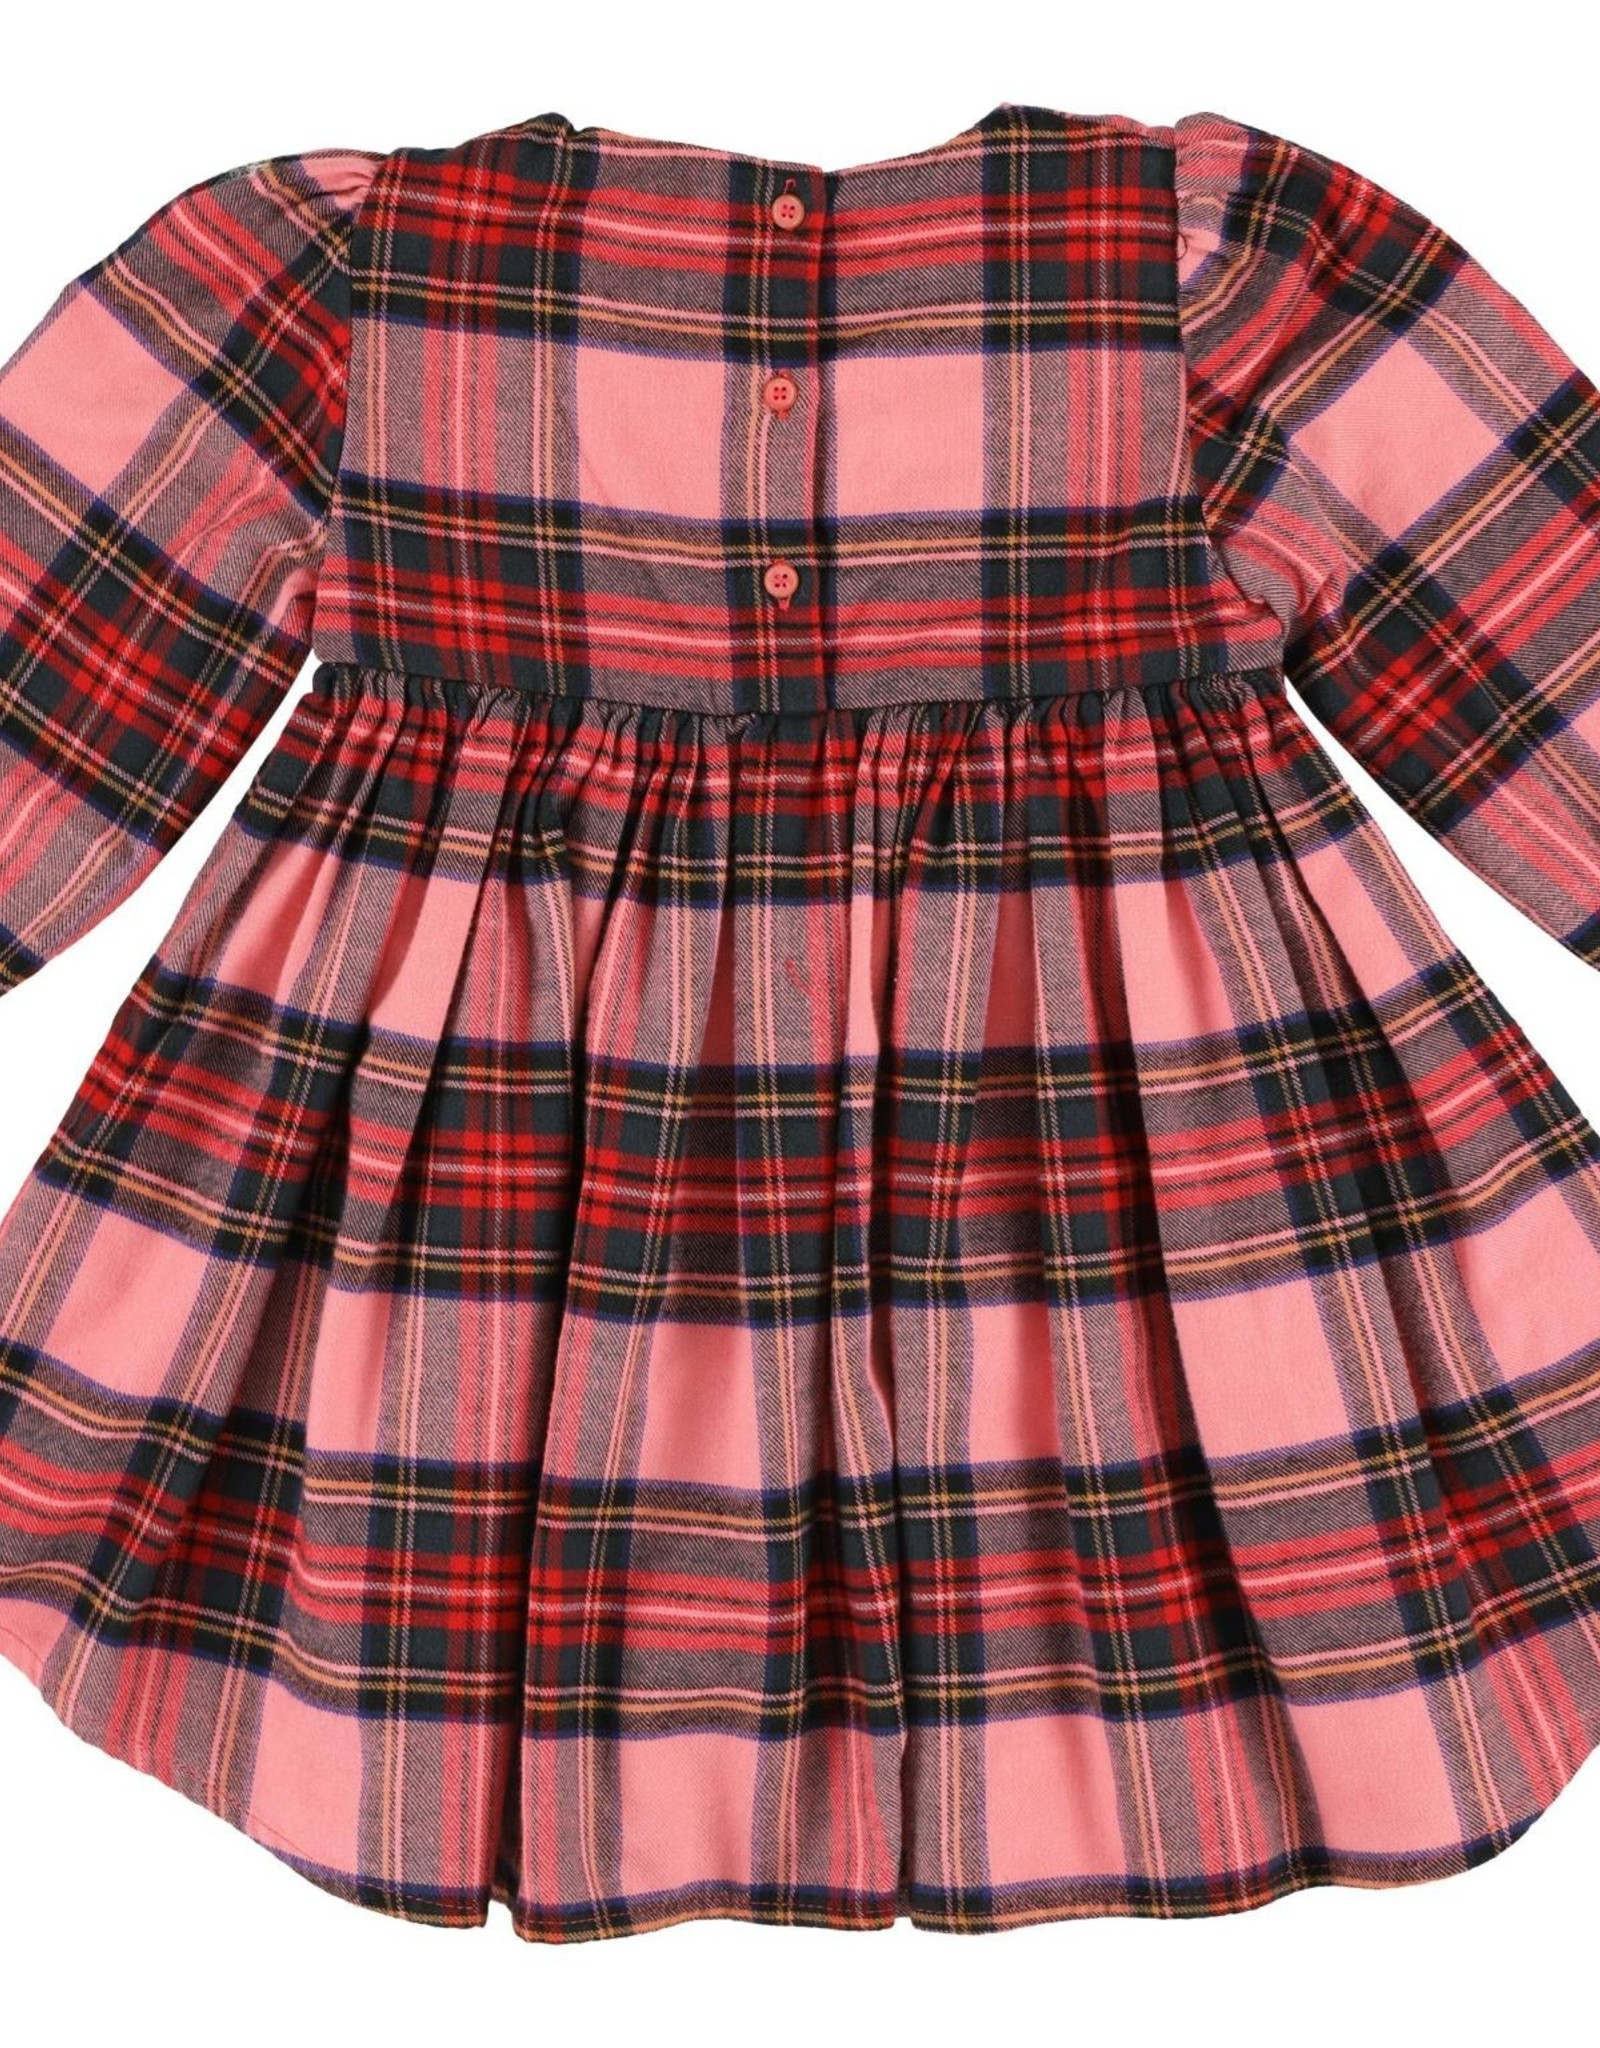 MORLEY Kenzie Clan Clover Dress